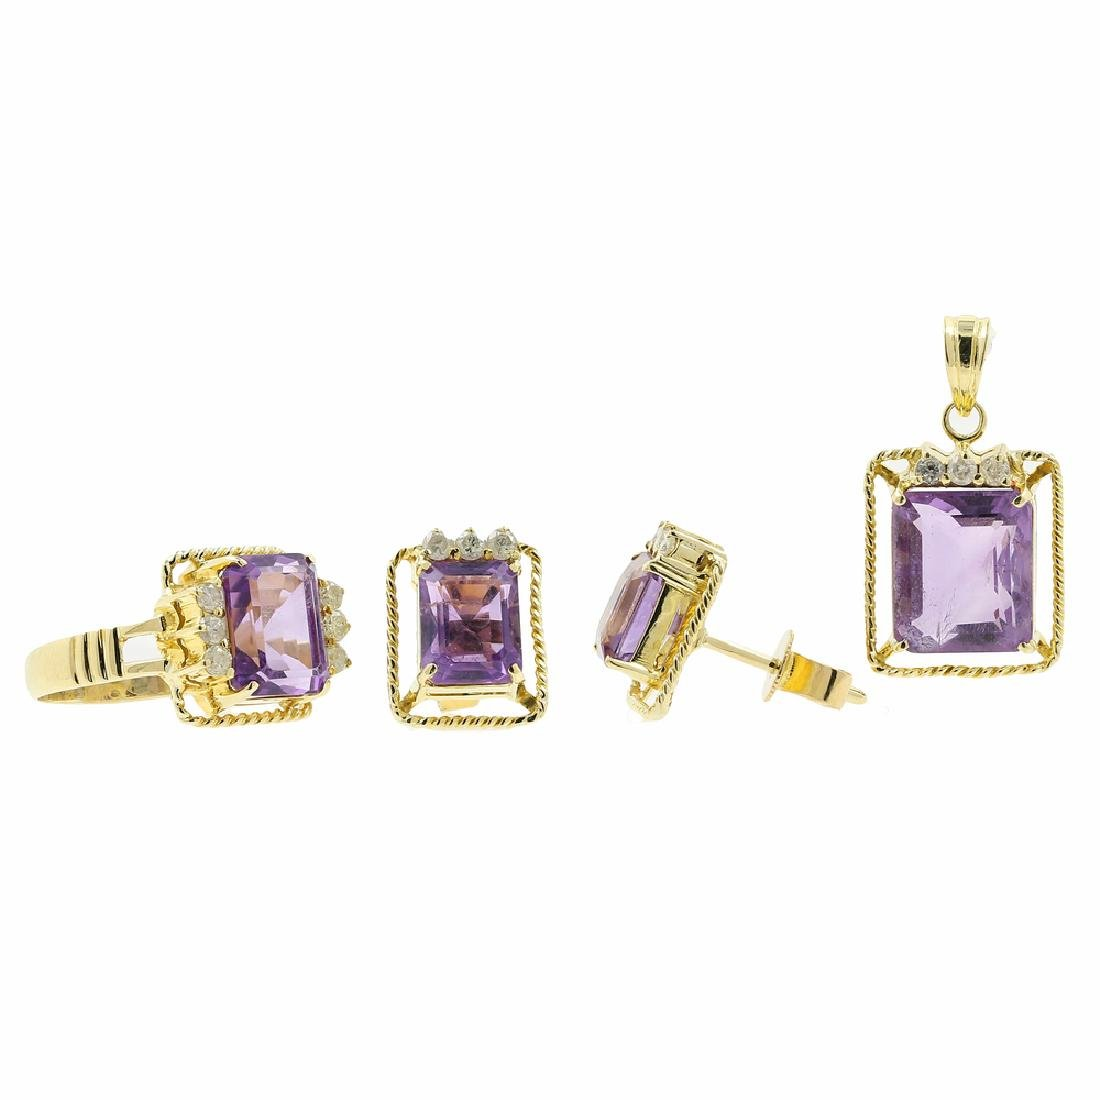 Estate 14K Yellow Gold Diamond & Amethyst Ring Earrings